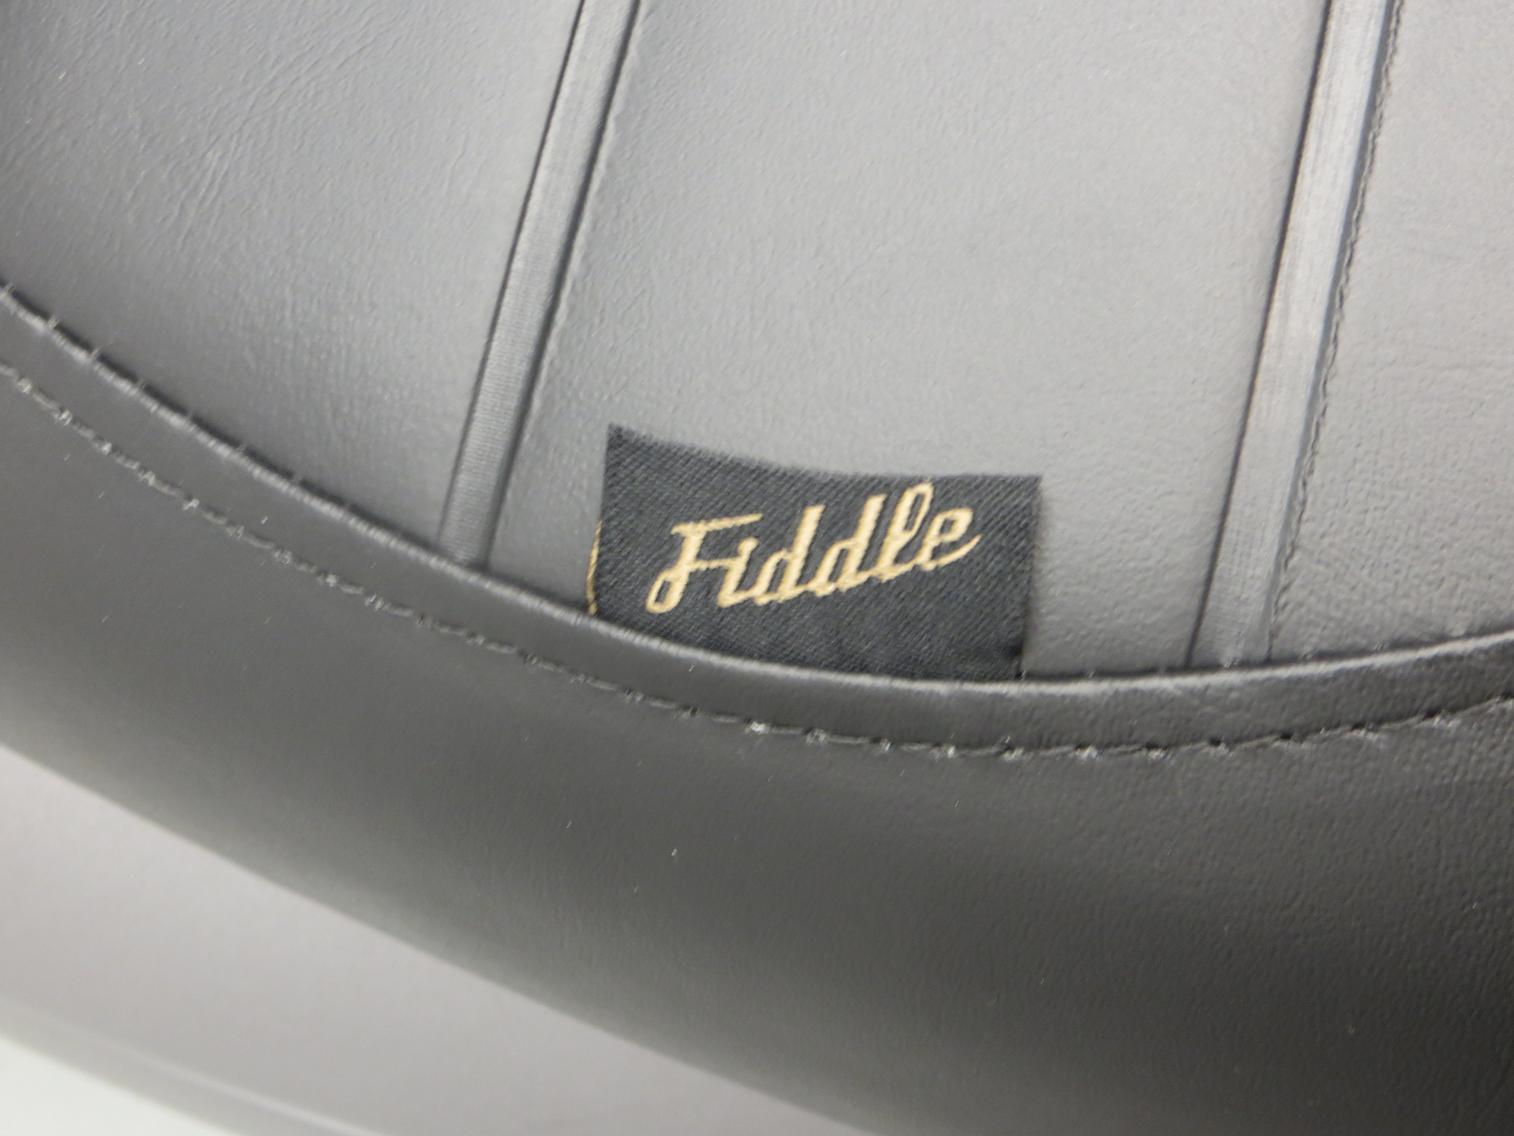 SYM - FIDDLE III 25KM/H EURO4 RIJK